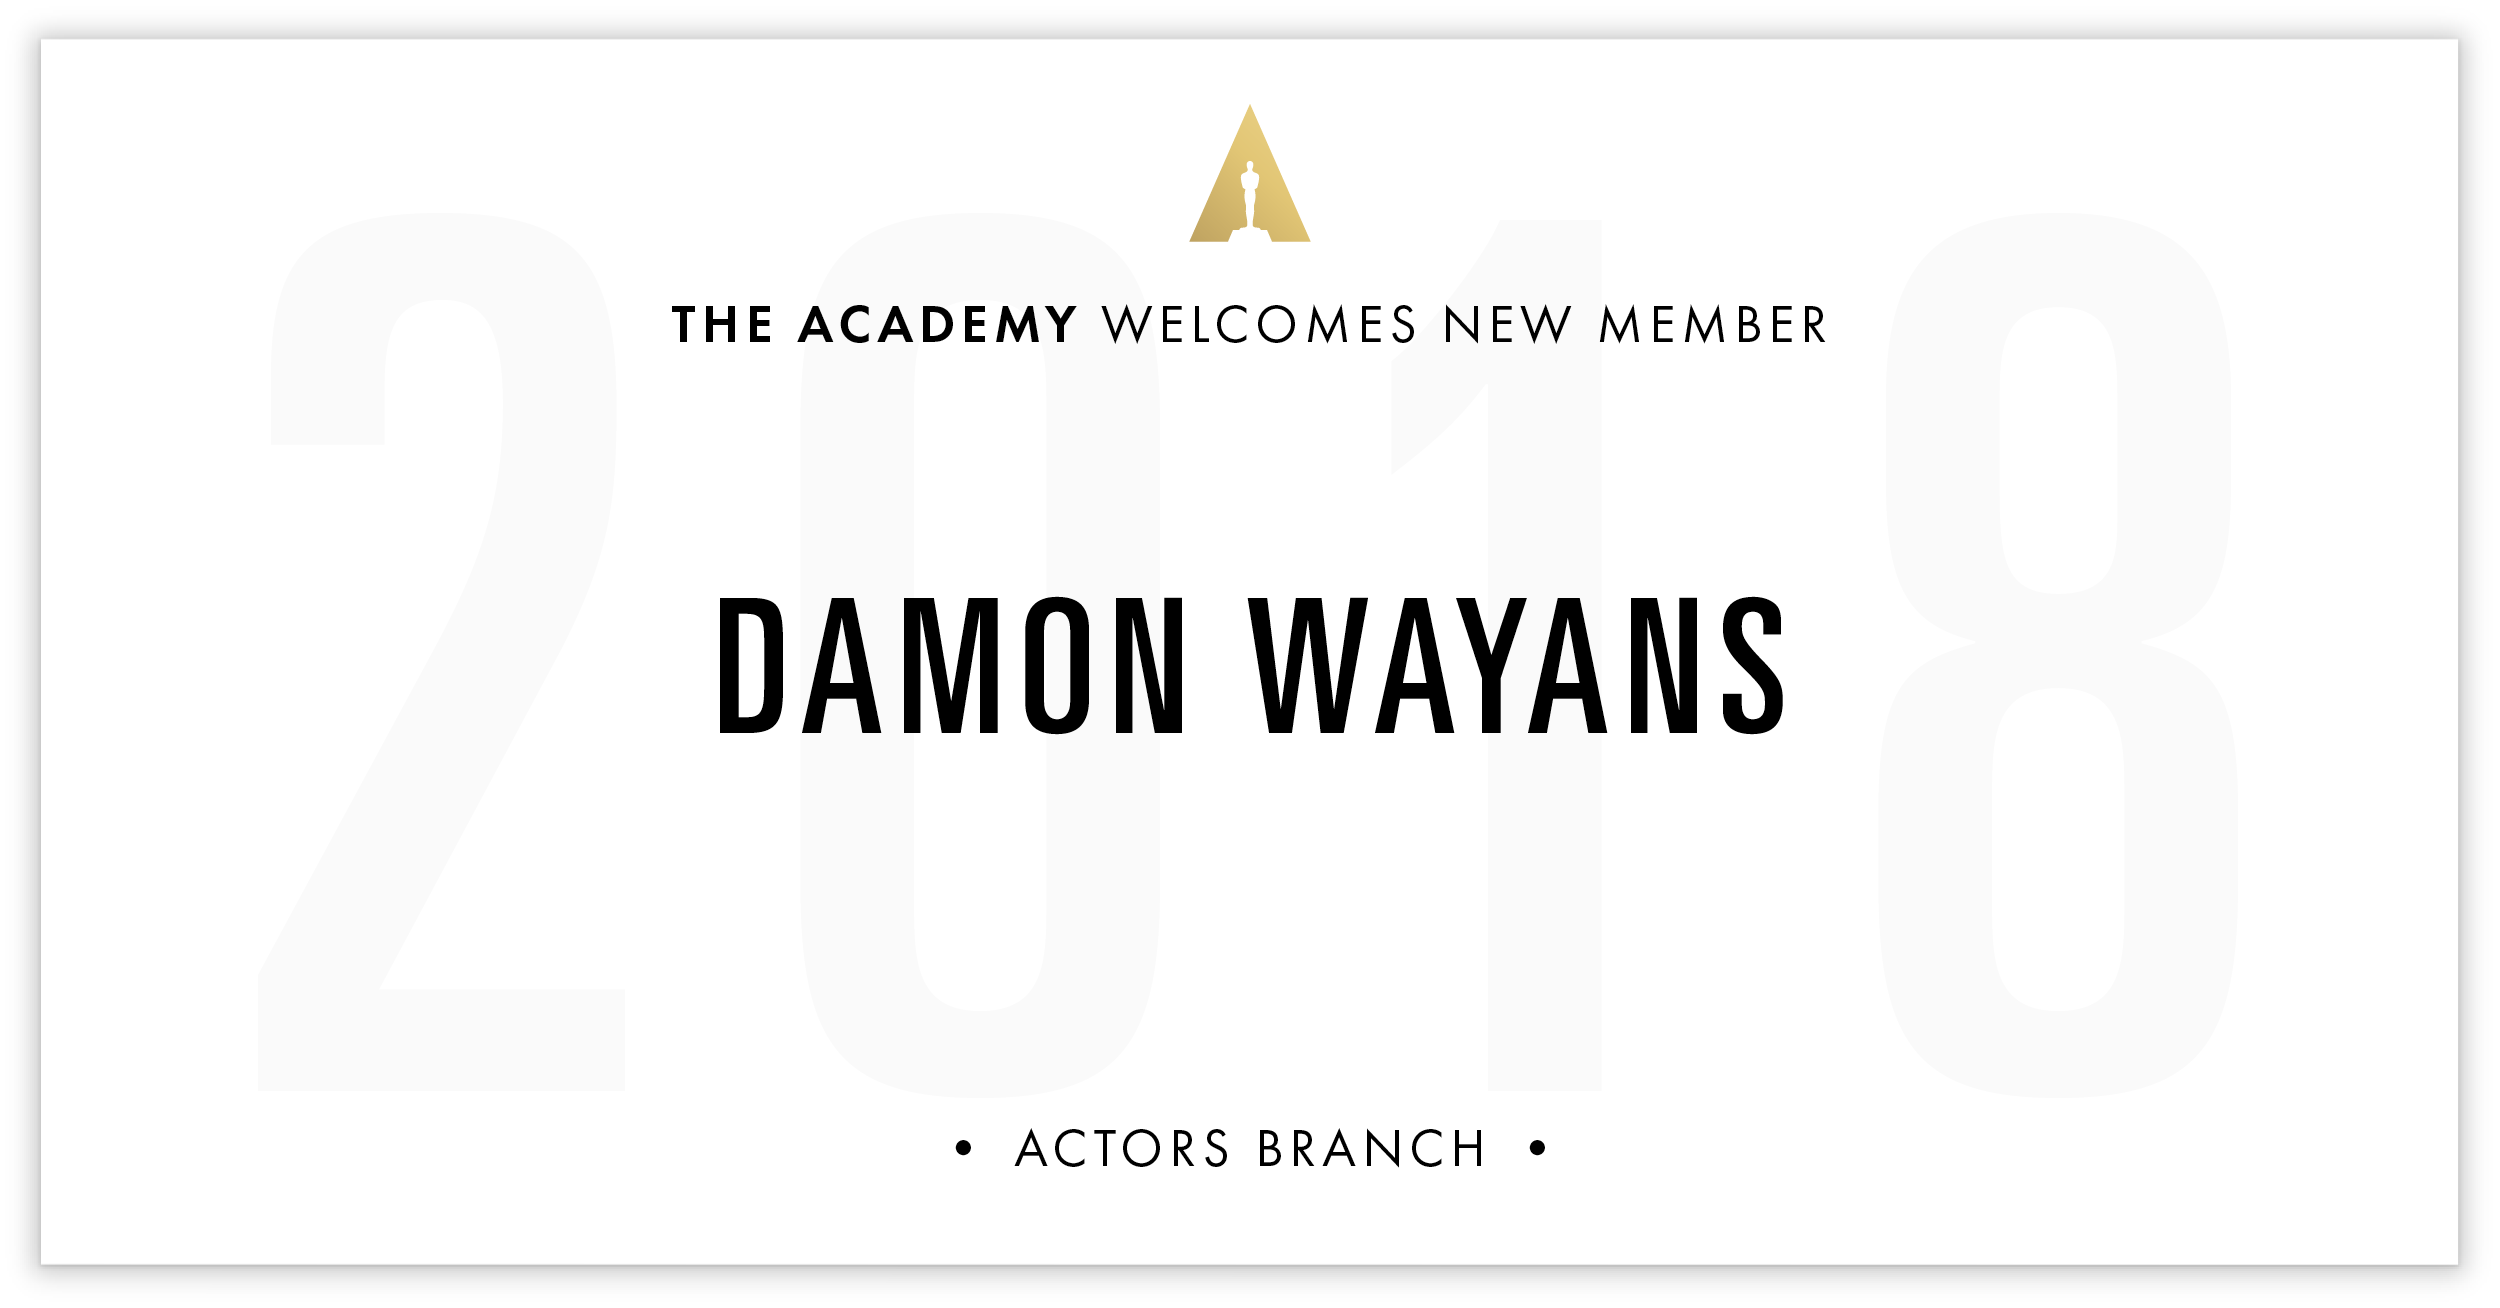 Damon Wayans is invited!